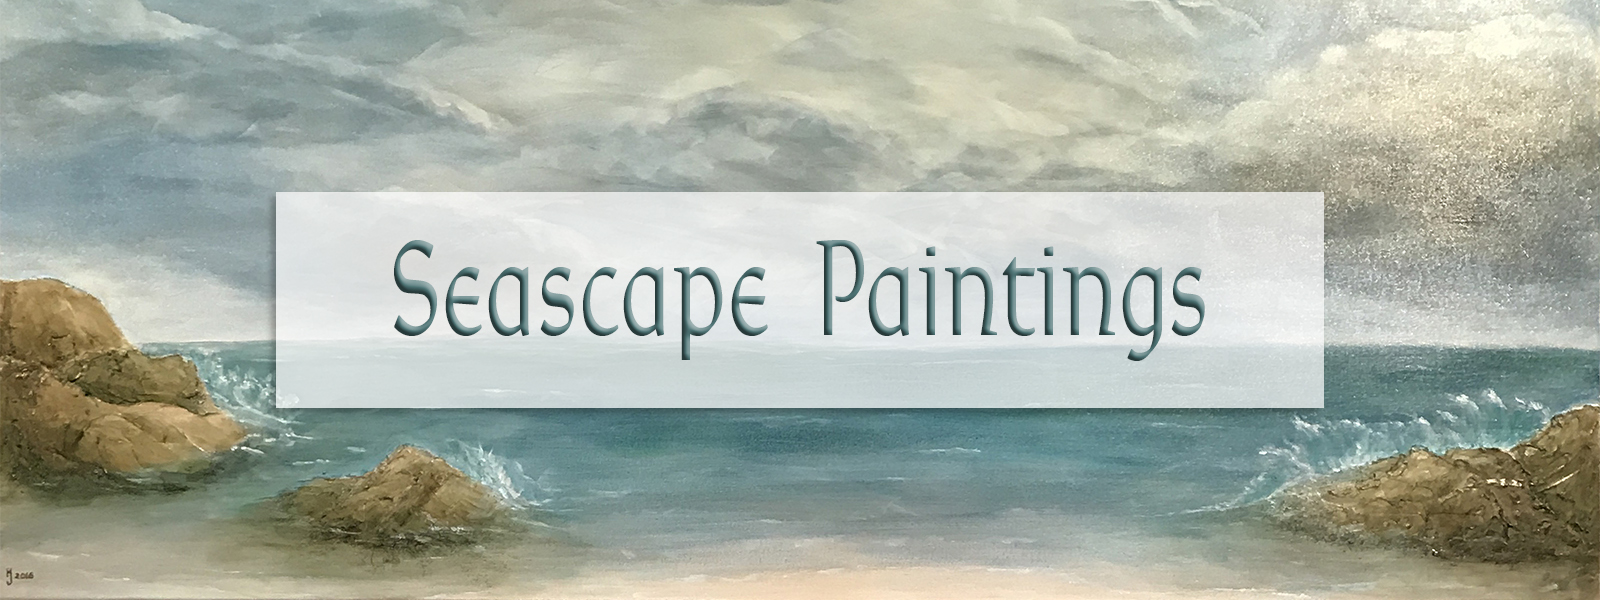 KJ's Art Studio - KJsArtStudio.com | Original Seascape Paintings by Fine Artist, KJ Burk.